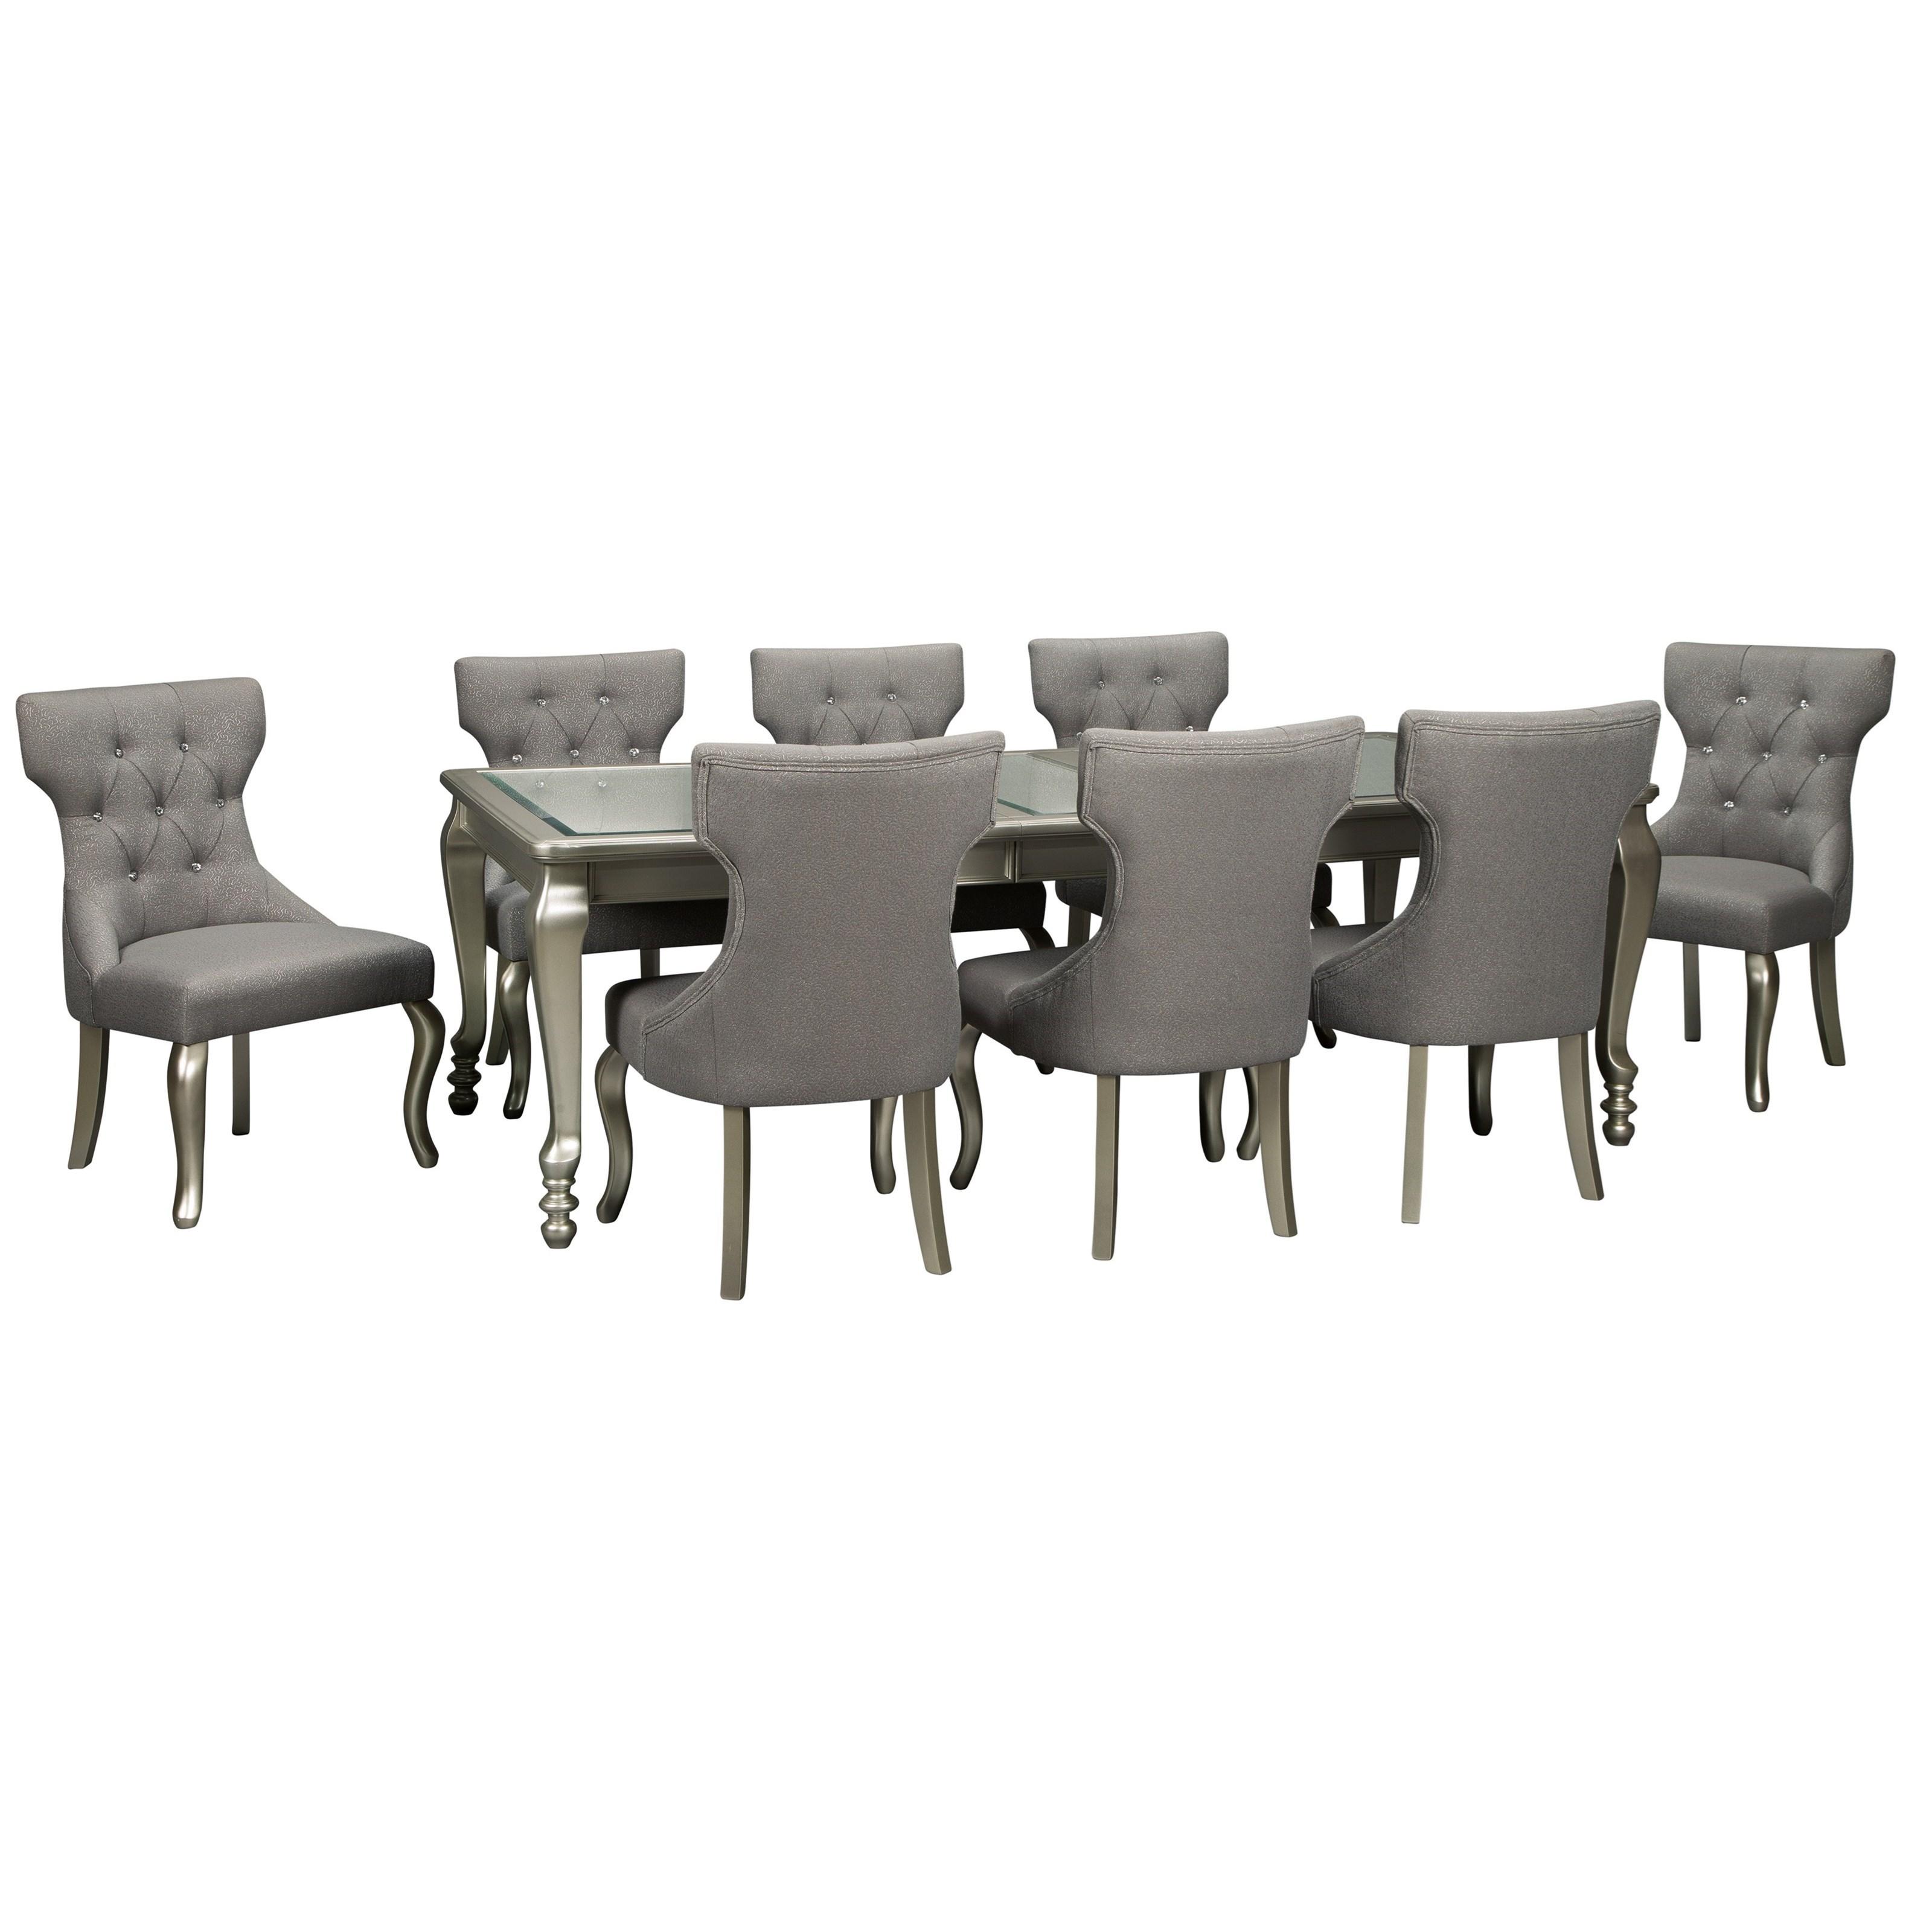 Coralayne 9-Piece Rectangular Dining Room Table Set by Ashley (Signature Design) at Johnny Janosik